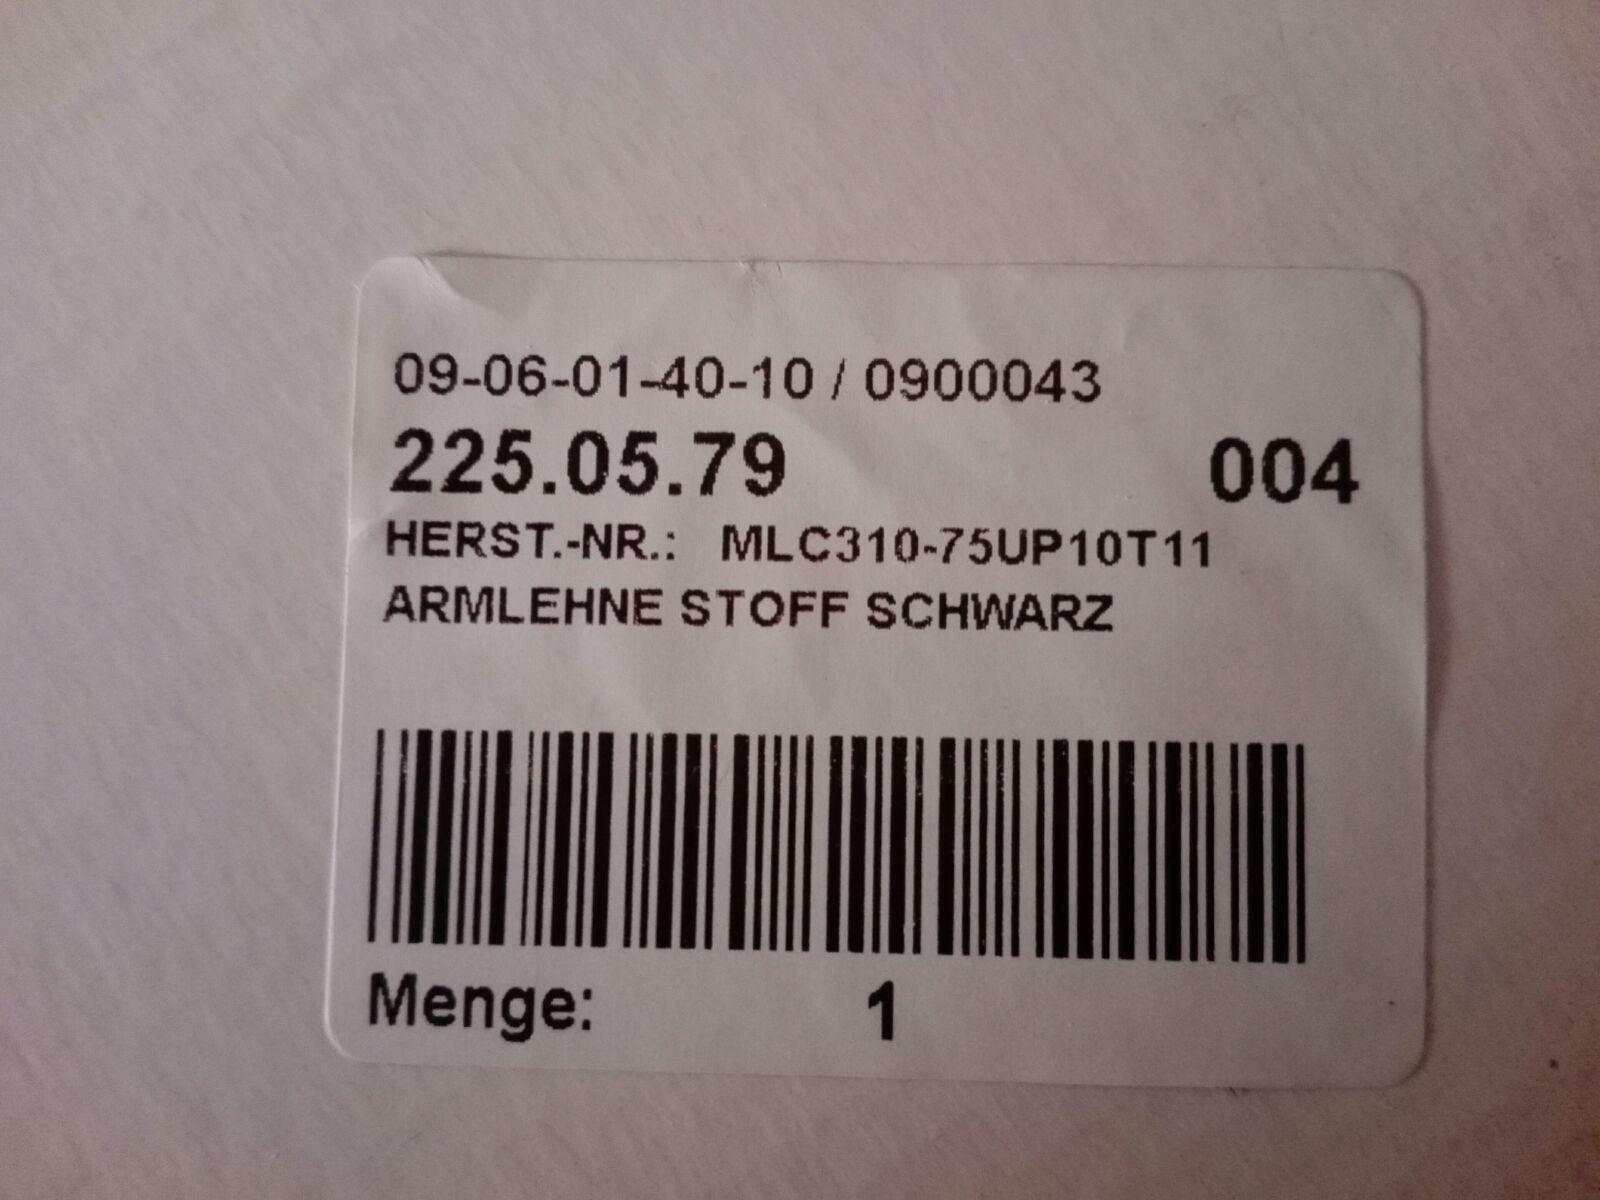 57e925a7-f059-465b-b692-45420e3a4b7a.jpg.e732491d83cf4d7a6879566c8ec7b814.jpg